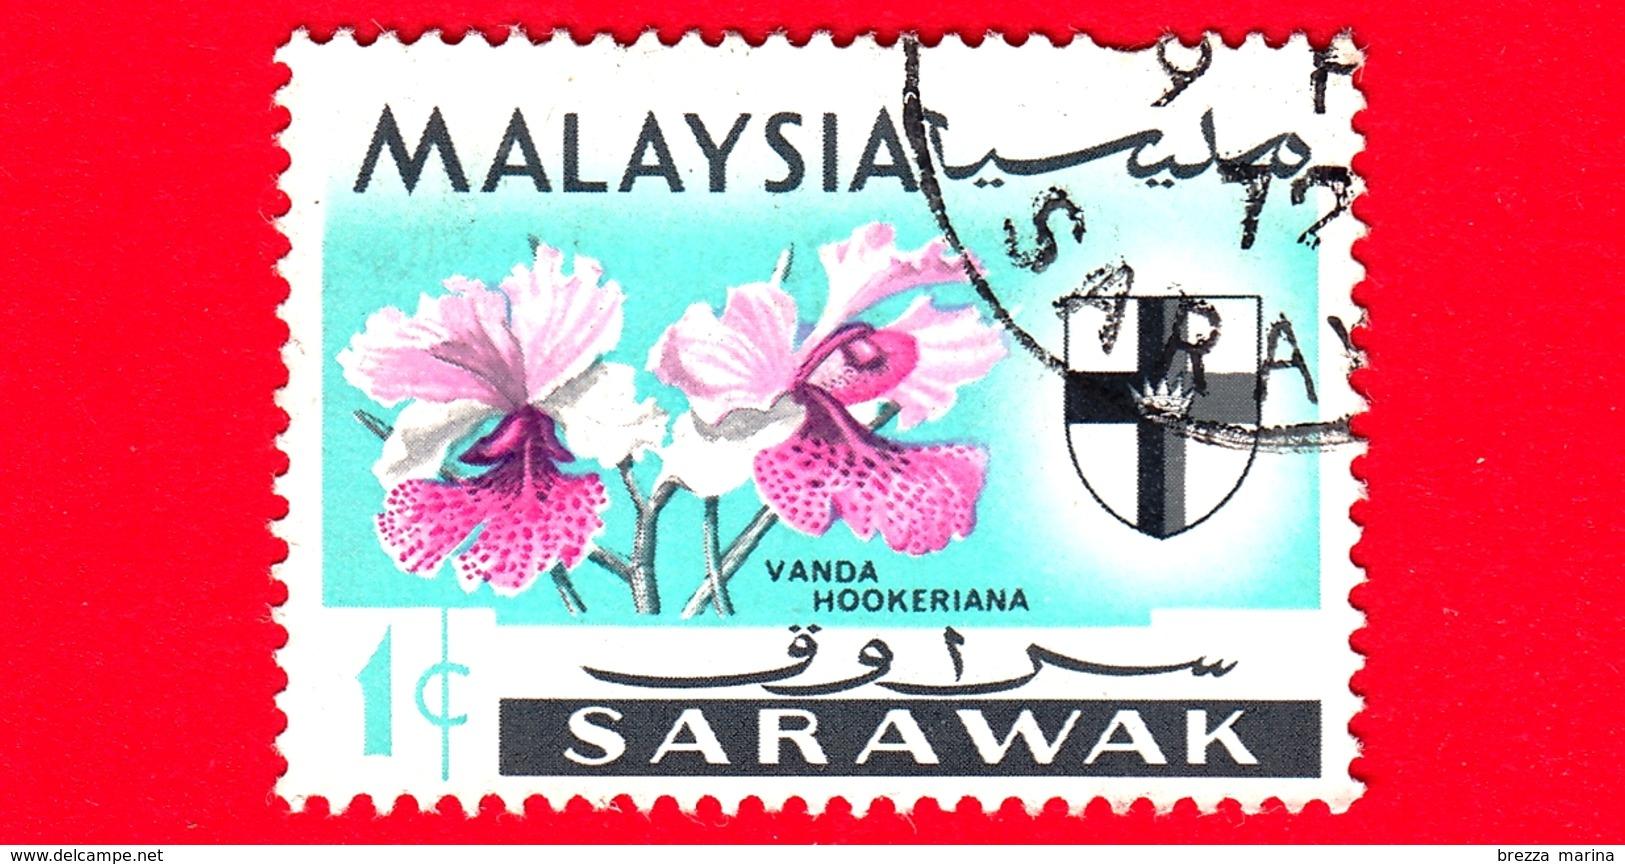 MALESIA - MALAYSIA - Usato - SARAVAK - 1965 - Fiori - Orchidee - Vanda Hookeriana - Stemmi Araldici - 1 - Malesia (1964-...)